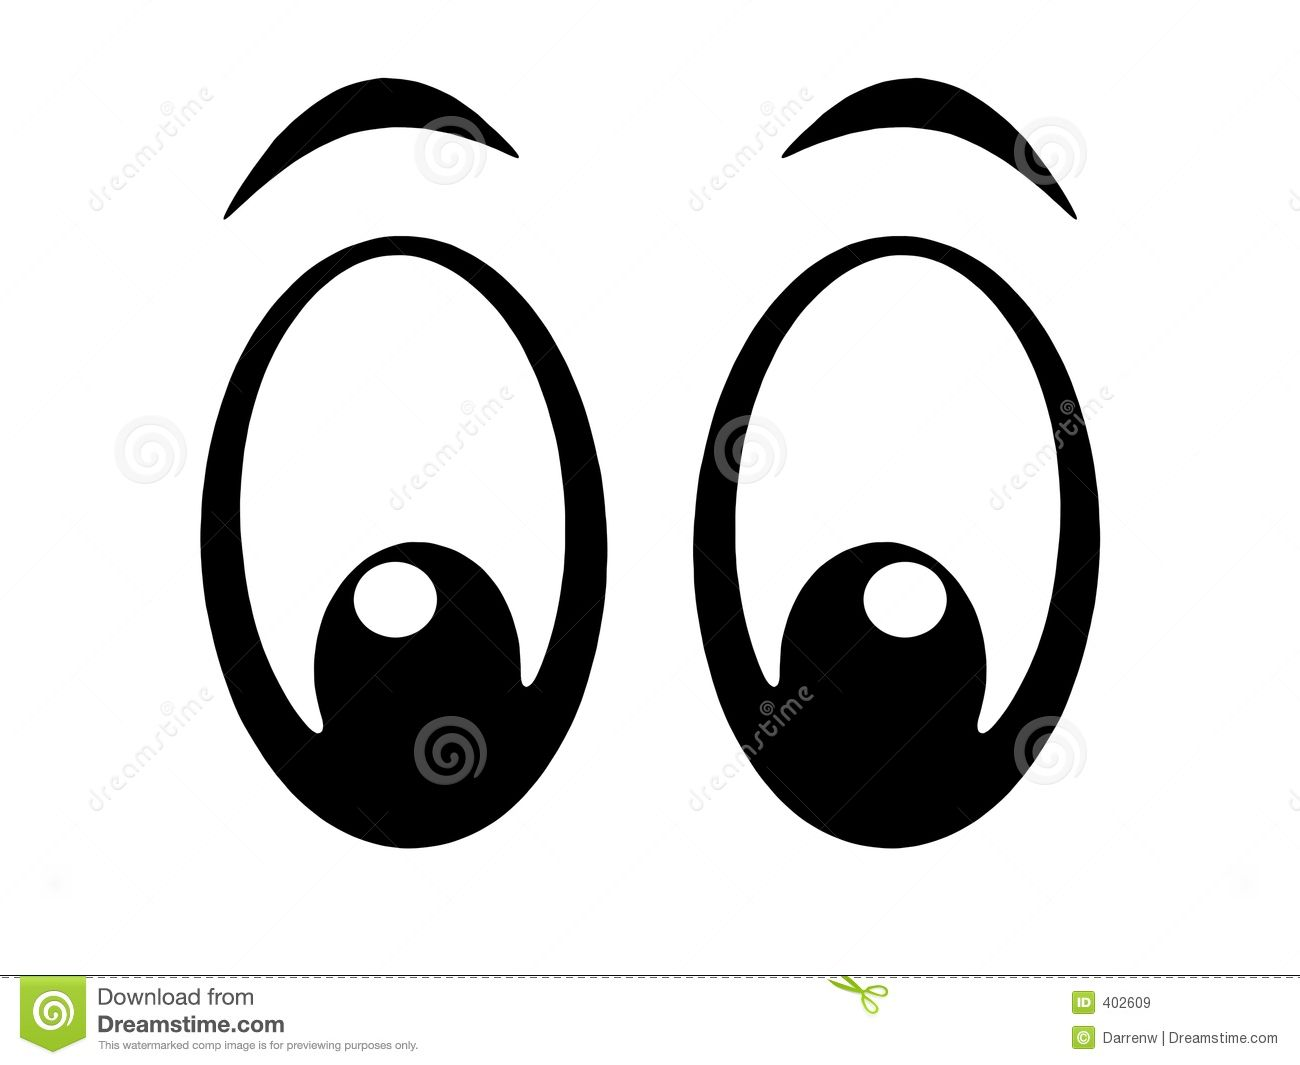 Eyes Bw Royalty Free Stock Images.